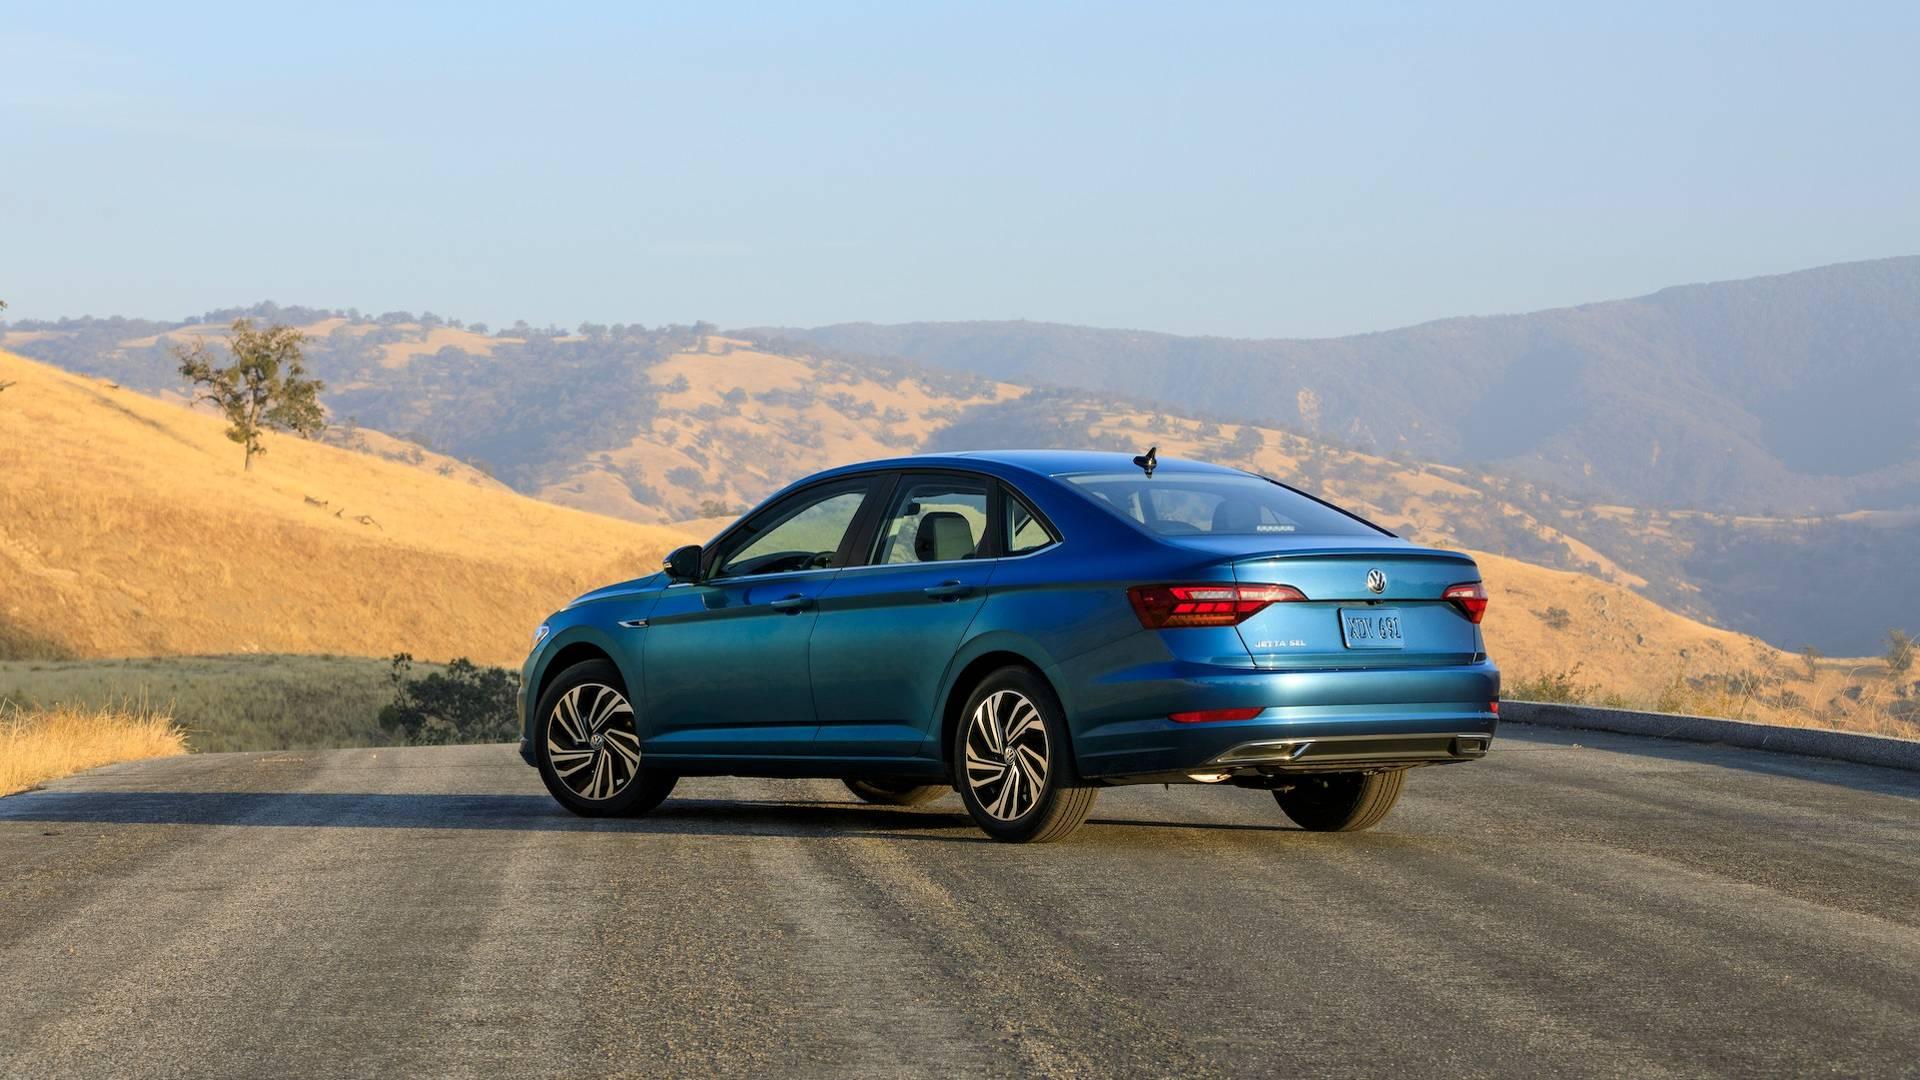 2020 Volkswagen Jetta GLI Confirmed With Independent Rear ...